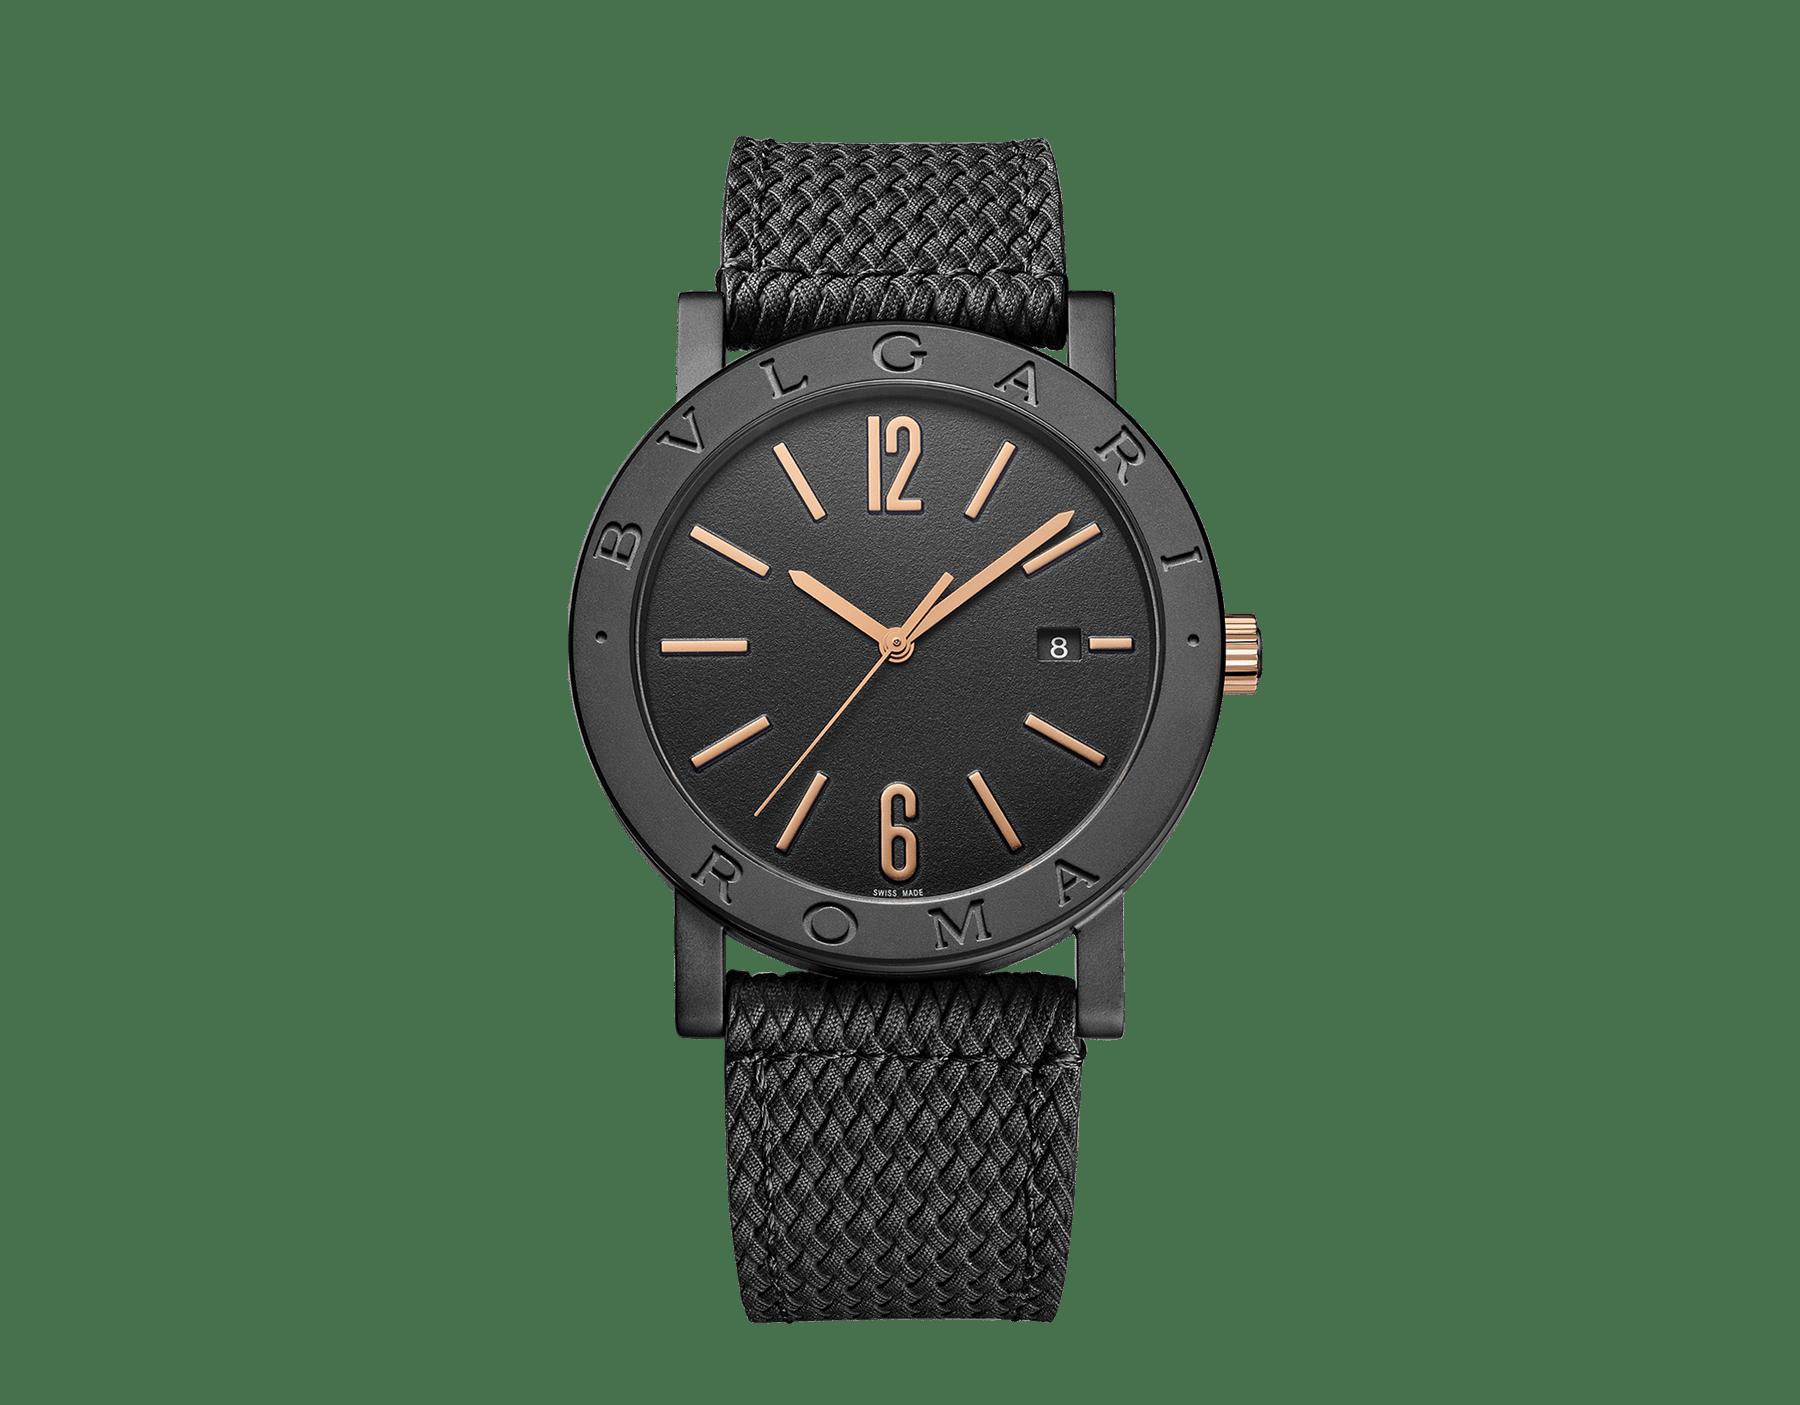 BVLGARI BVLGARI 城市特別版「羅馬」腕錶,搭載機械機芯,自動上鍊。精鋼錶殼,黑色 DLC 類鑽碳高耐磨鍍膜。錶圈鐫刻 BVLGARI ROMA 字樣,透明底蓋。黑色漆面錶盤,玫瑰金時標。棕色小牛皮錶帶,可換式黑色橡膠錶帶。 103219 image 2